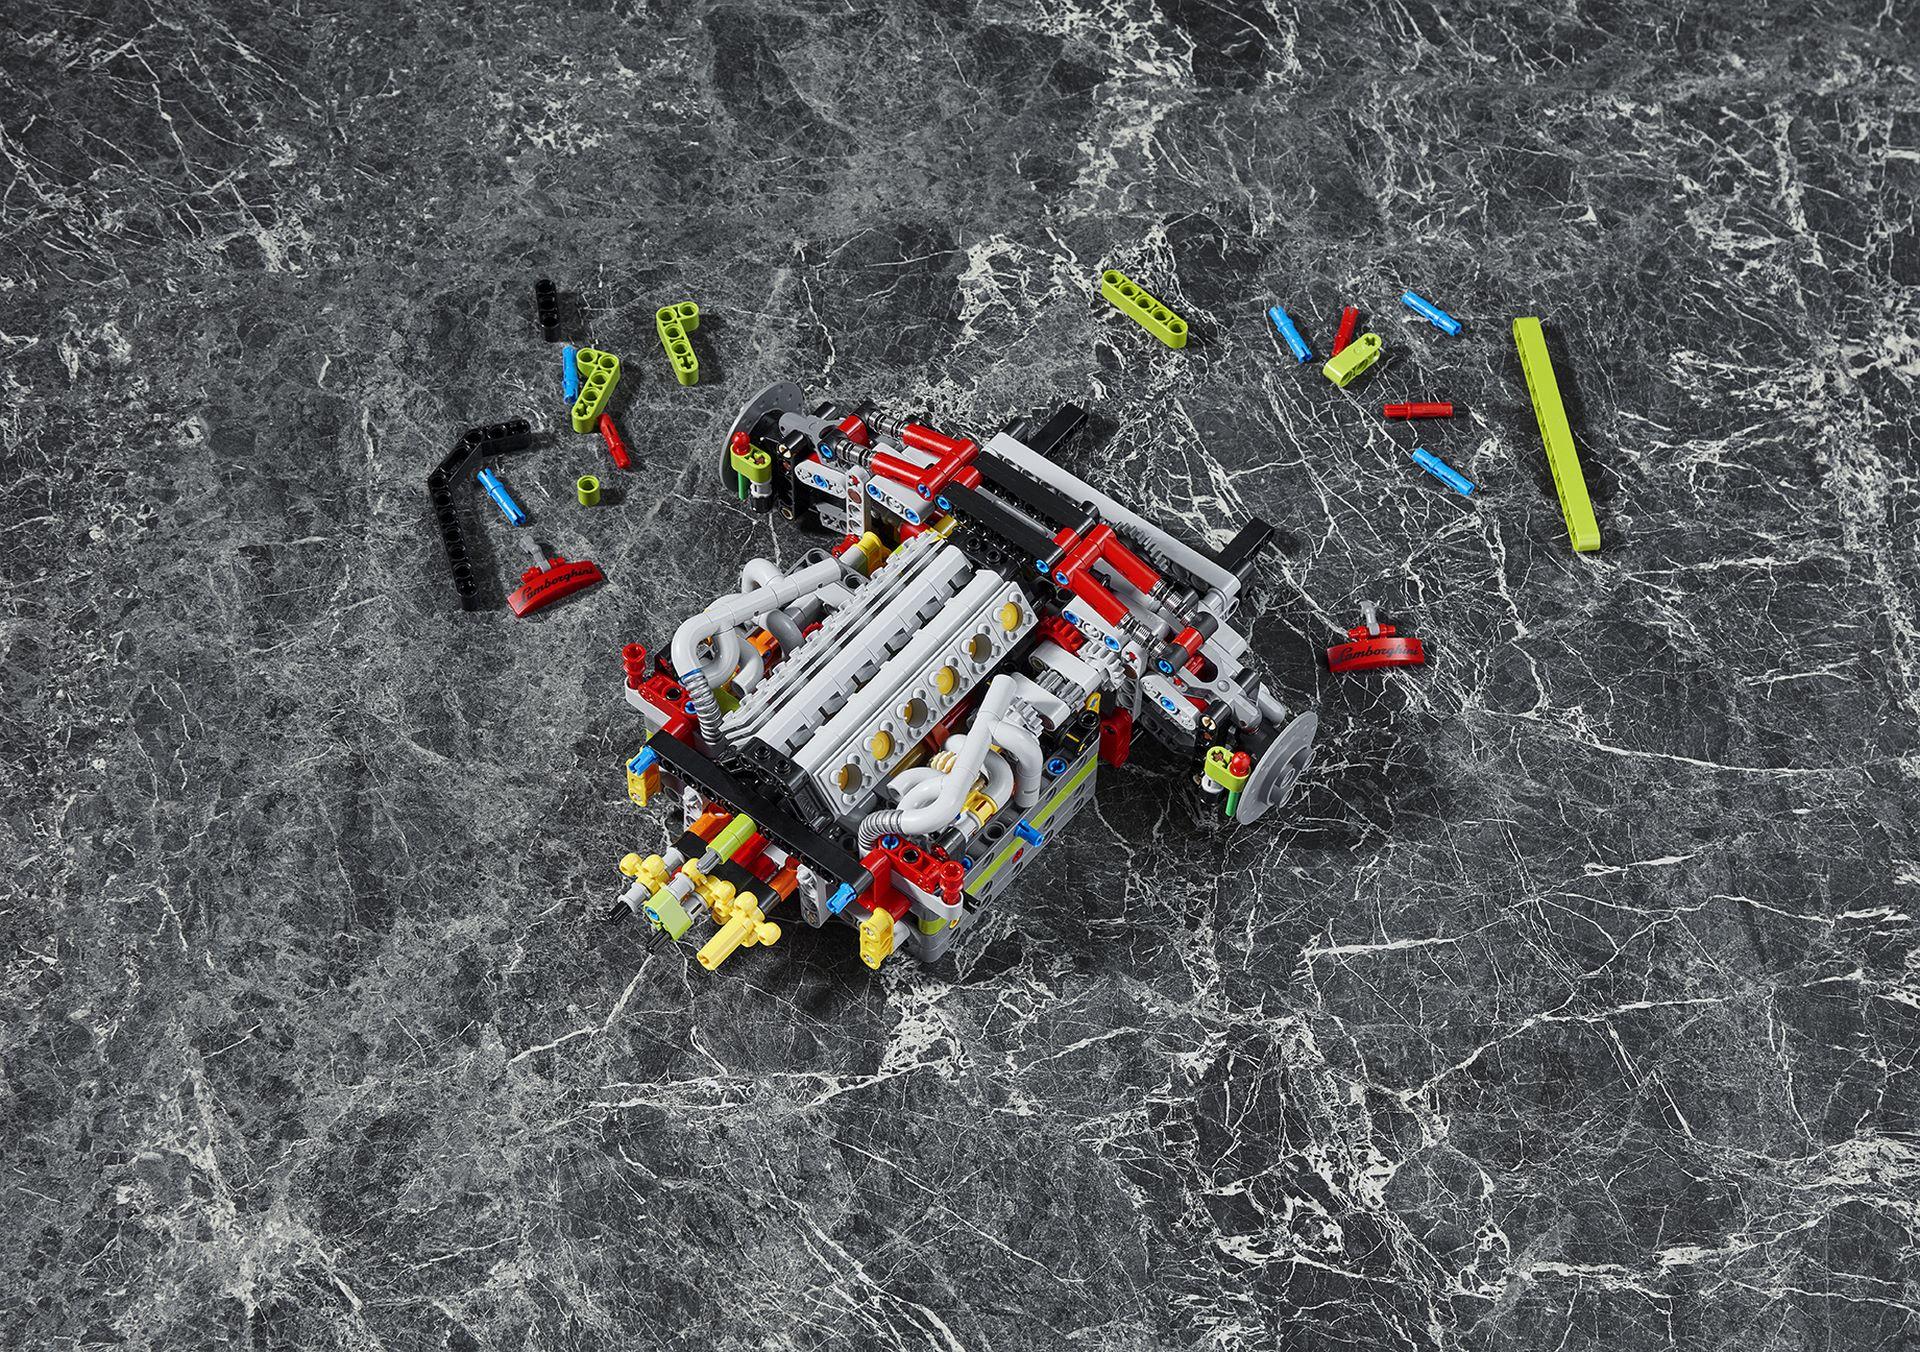 Lamborghini-Sian-FKP-37-Lego-Technic-9